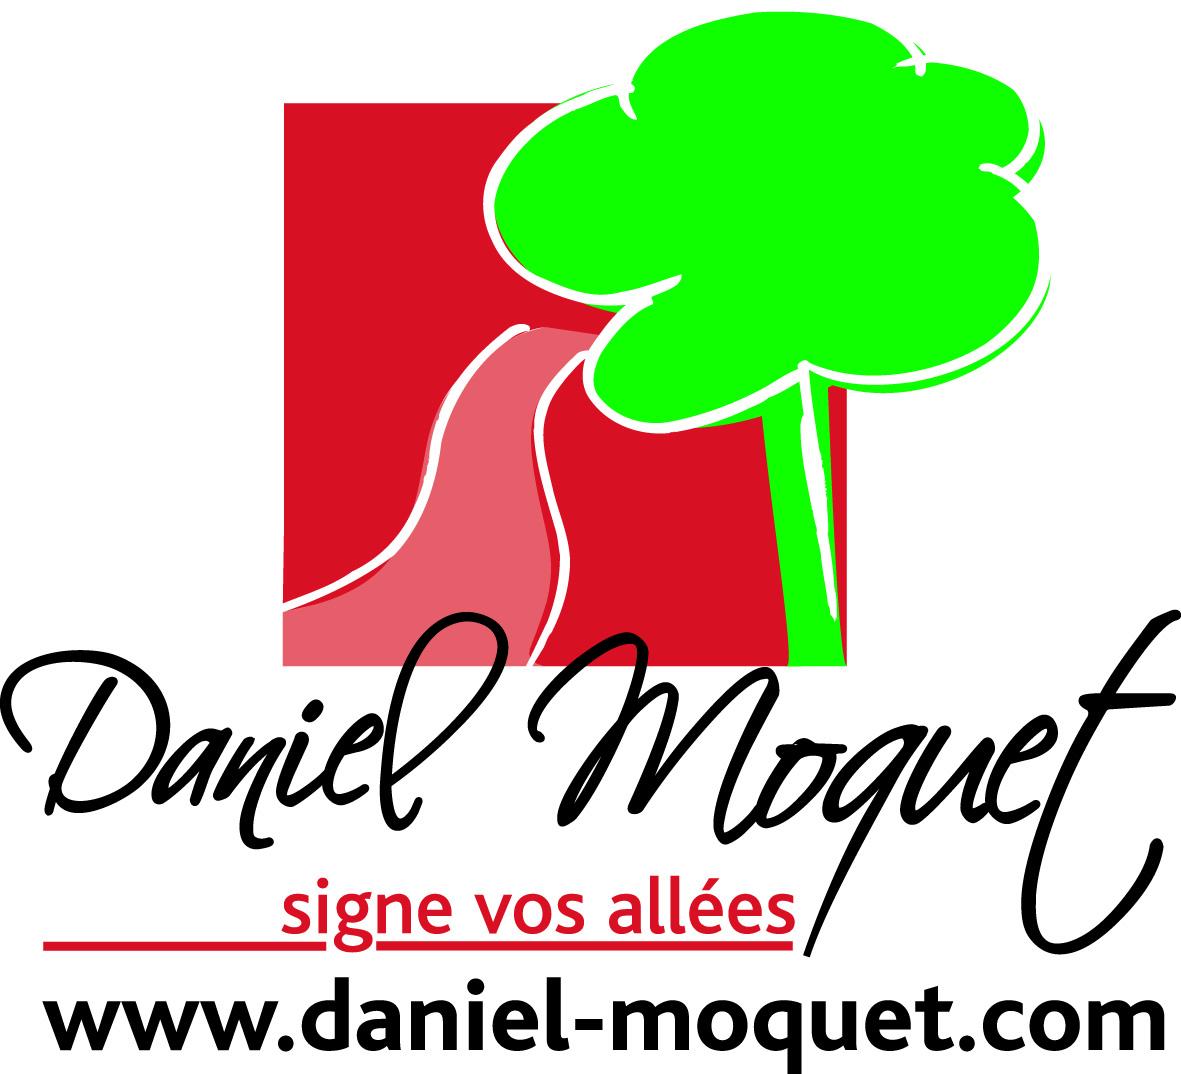 Daniel Moquet signe vos allées - Ent. Martin-Gillot